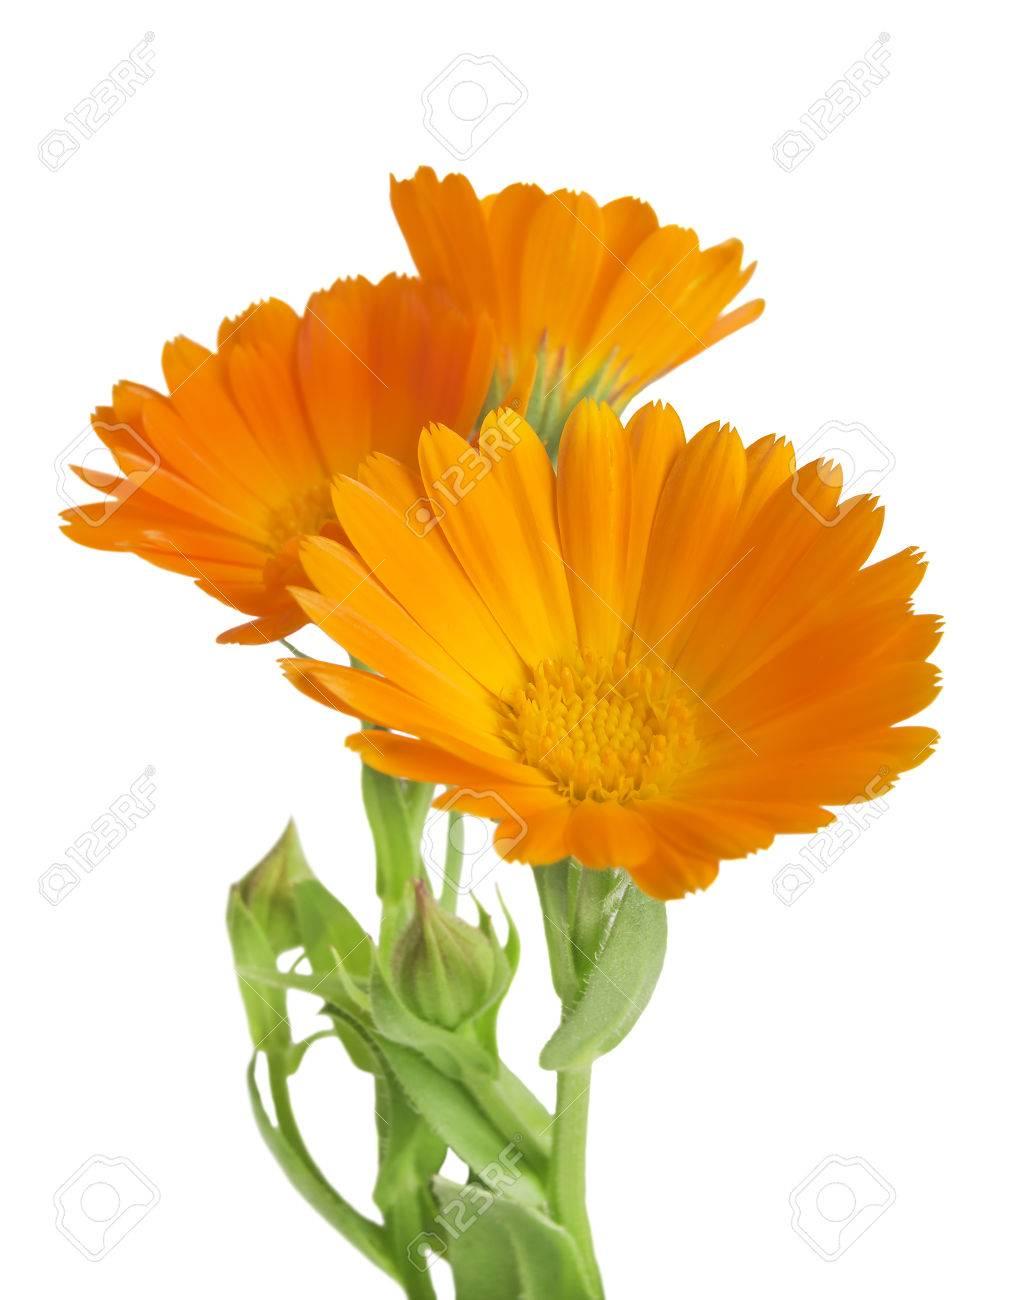 Calendula marigold flowers with leaves isolated on white stock marigold flowers with leaves isolated on white stock photo 42506472 mightylinksfo